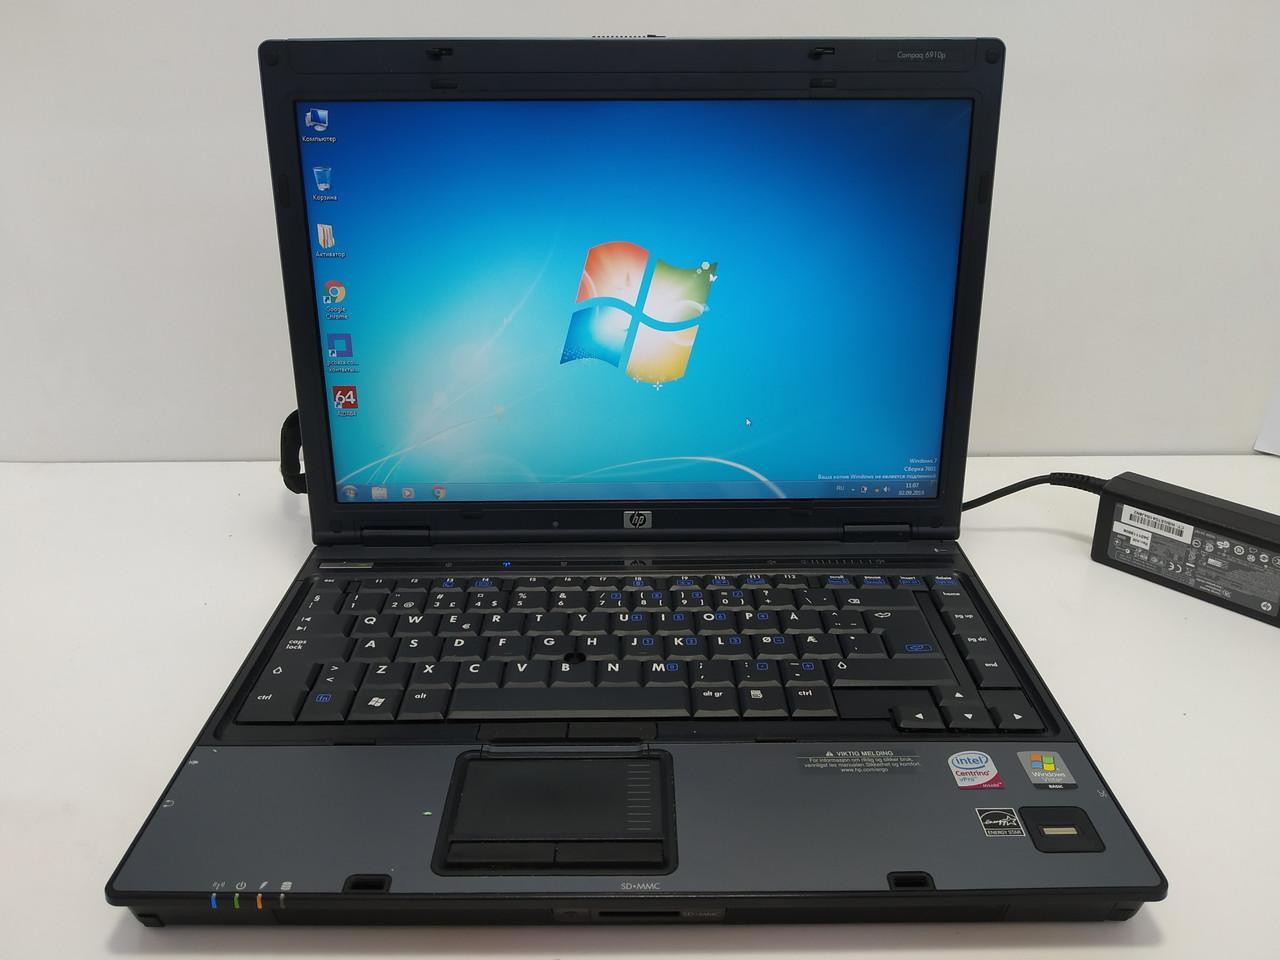 "14"" HP compaq 6910p Intel T7300 2.0, 2 ГБ, 160 ГБ hdd, батарея до 1 часа, Полностью настроен!"